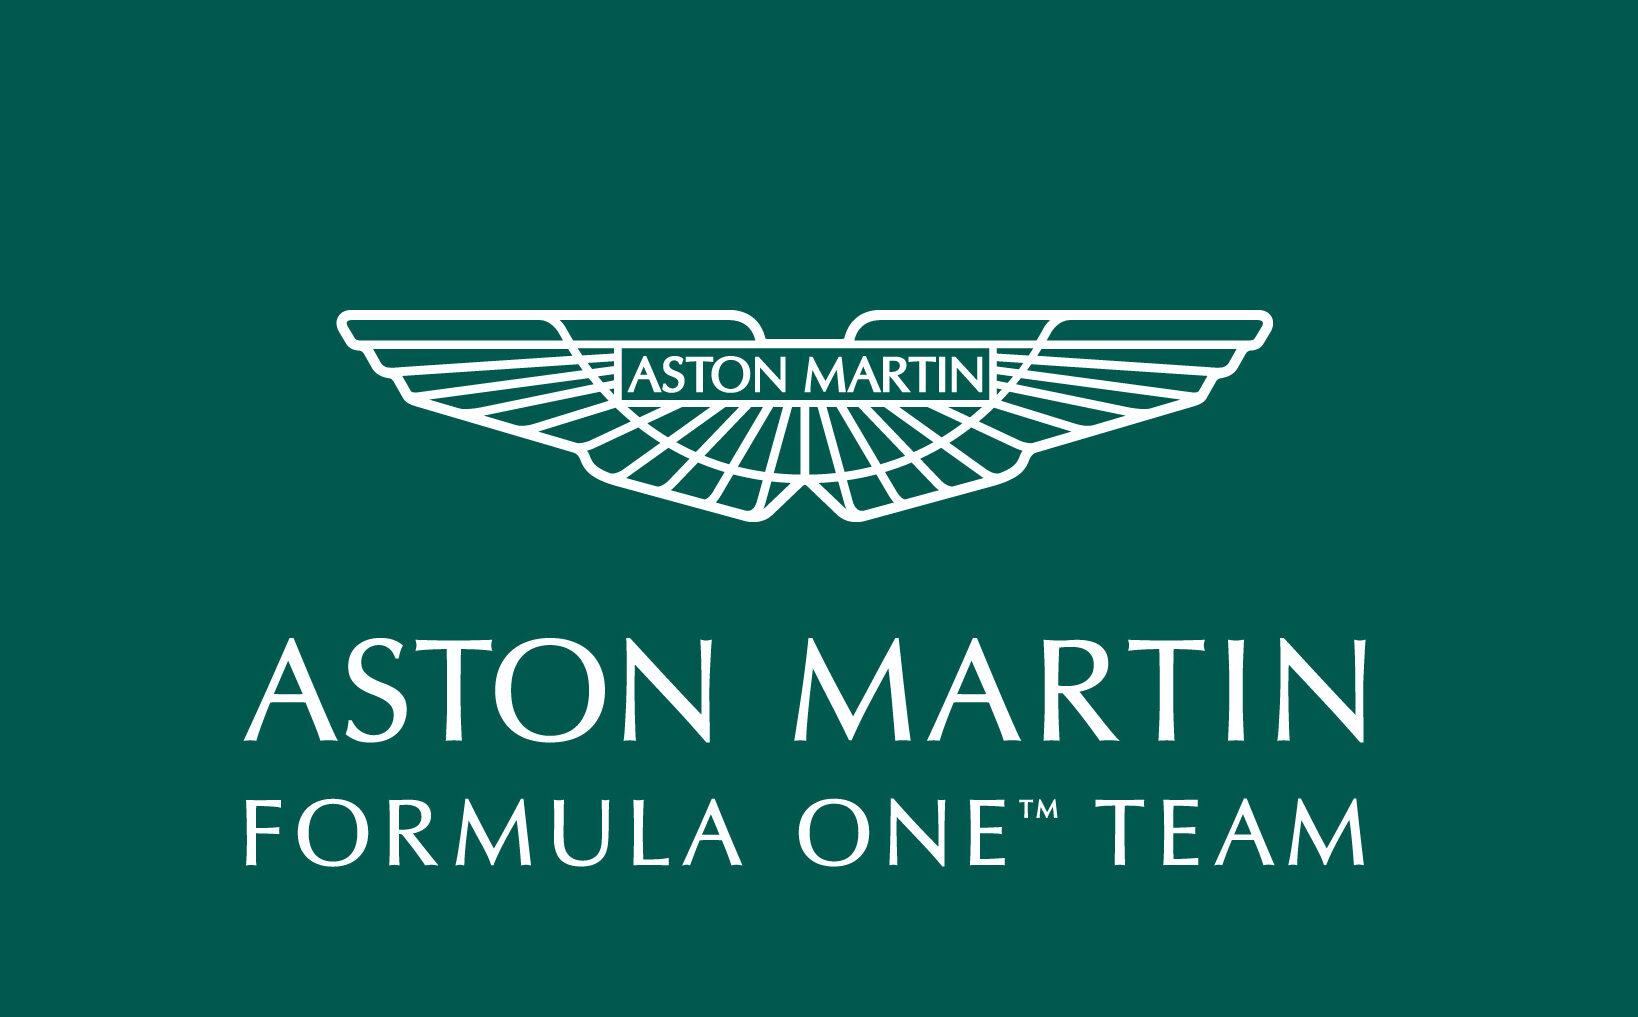 F1 : voici l'Aston Martin Formula One Team